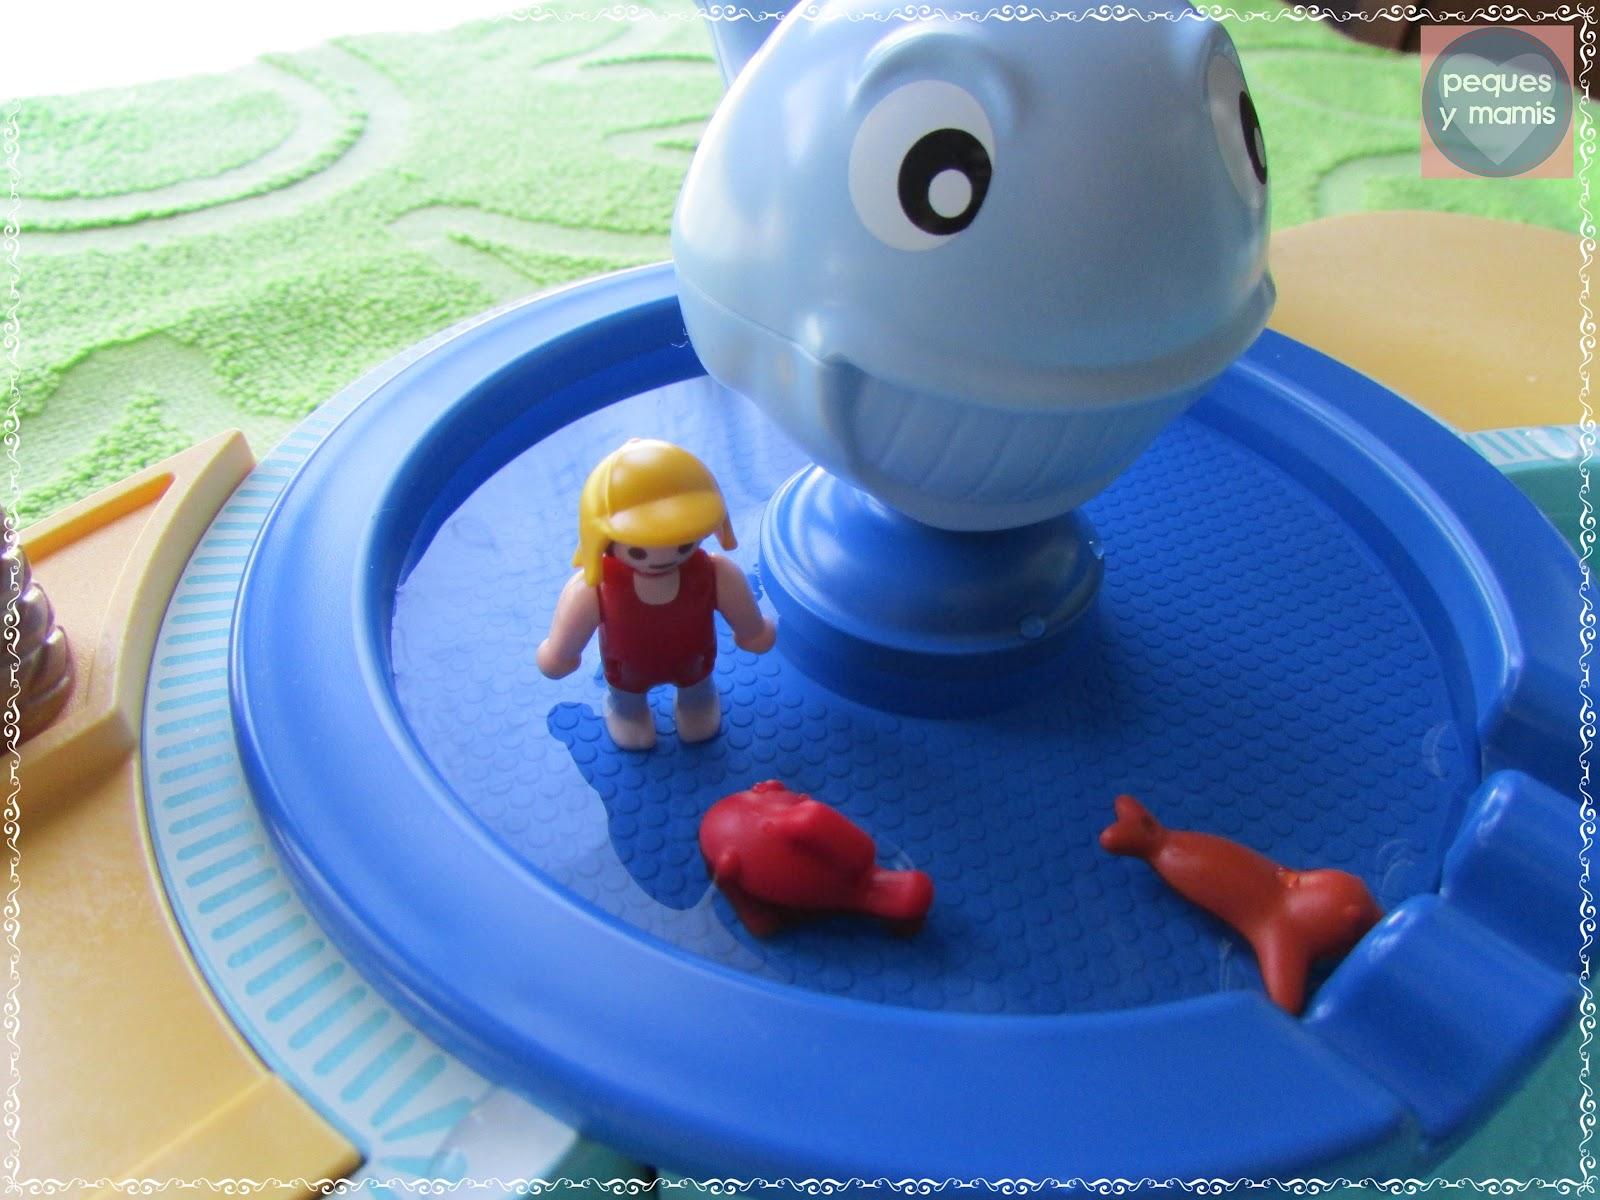 Pequesymamis piscina con fuente ballena - Playmobil piscina ballena ...